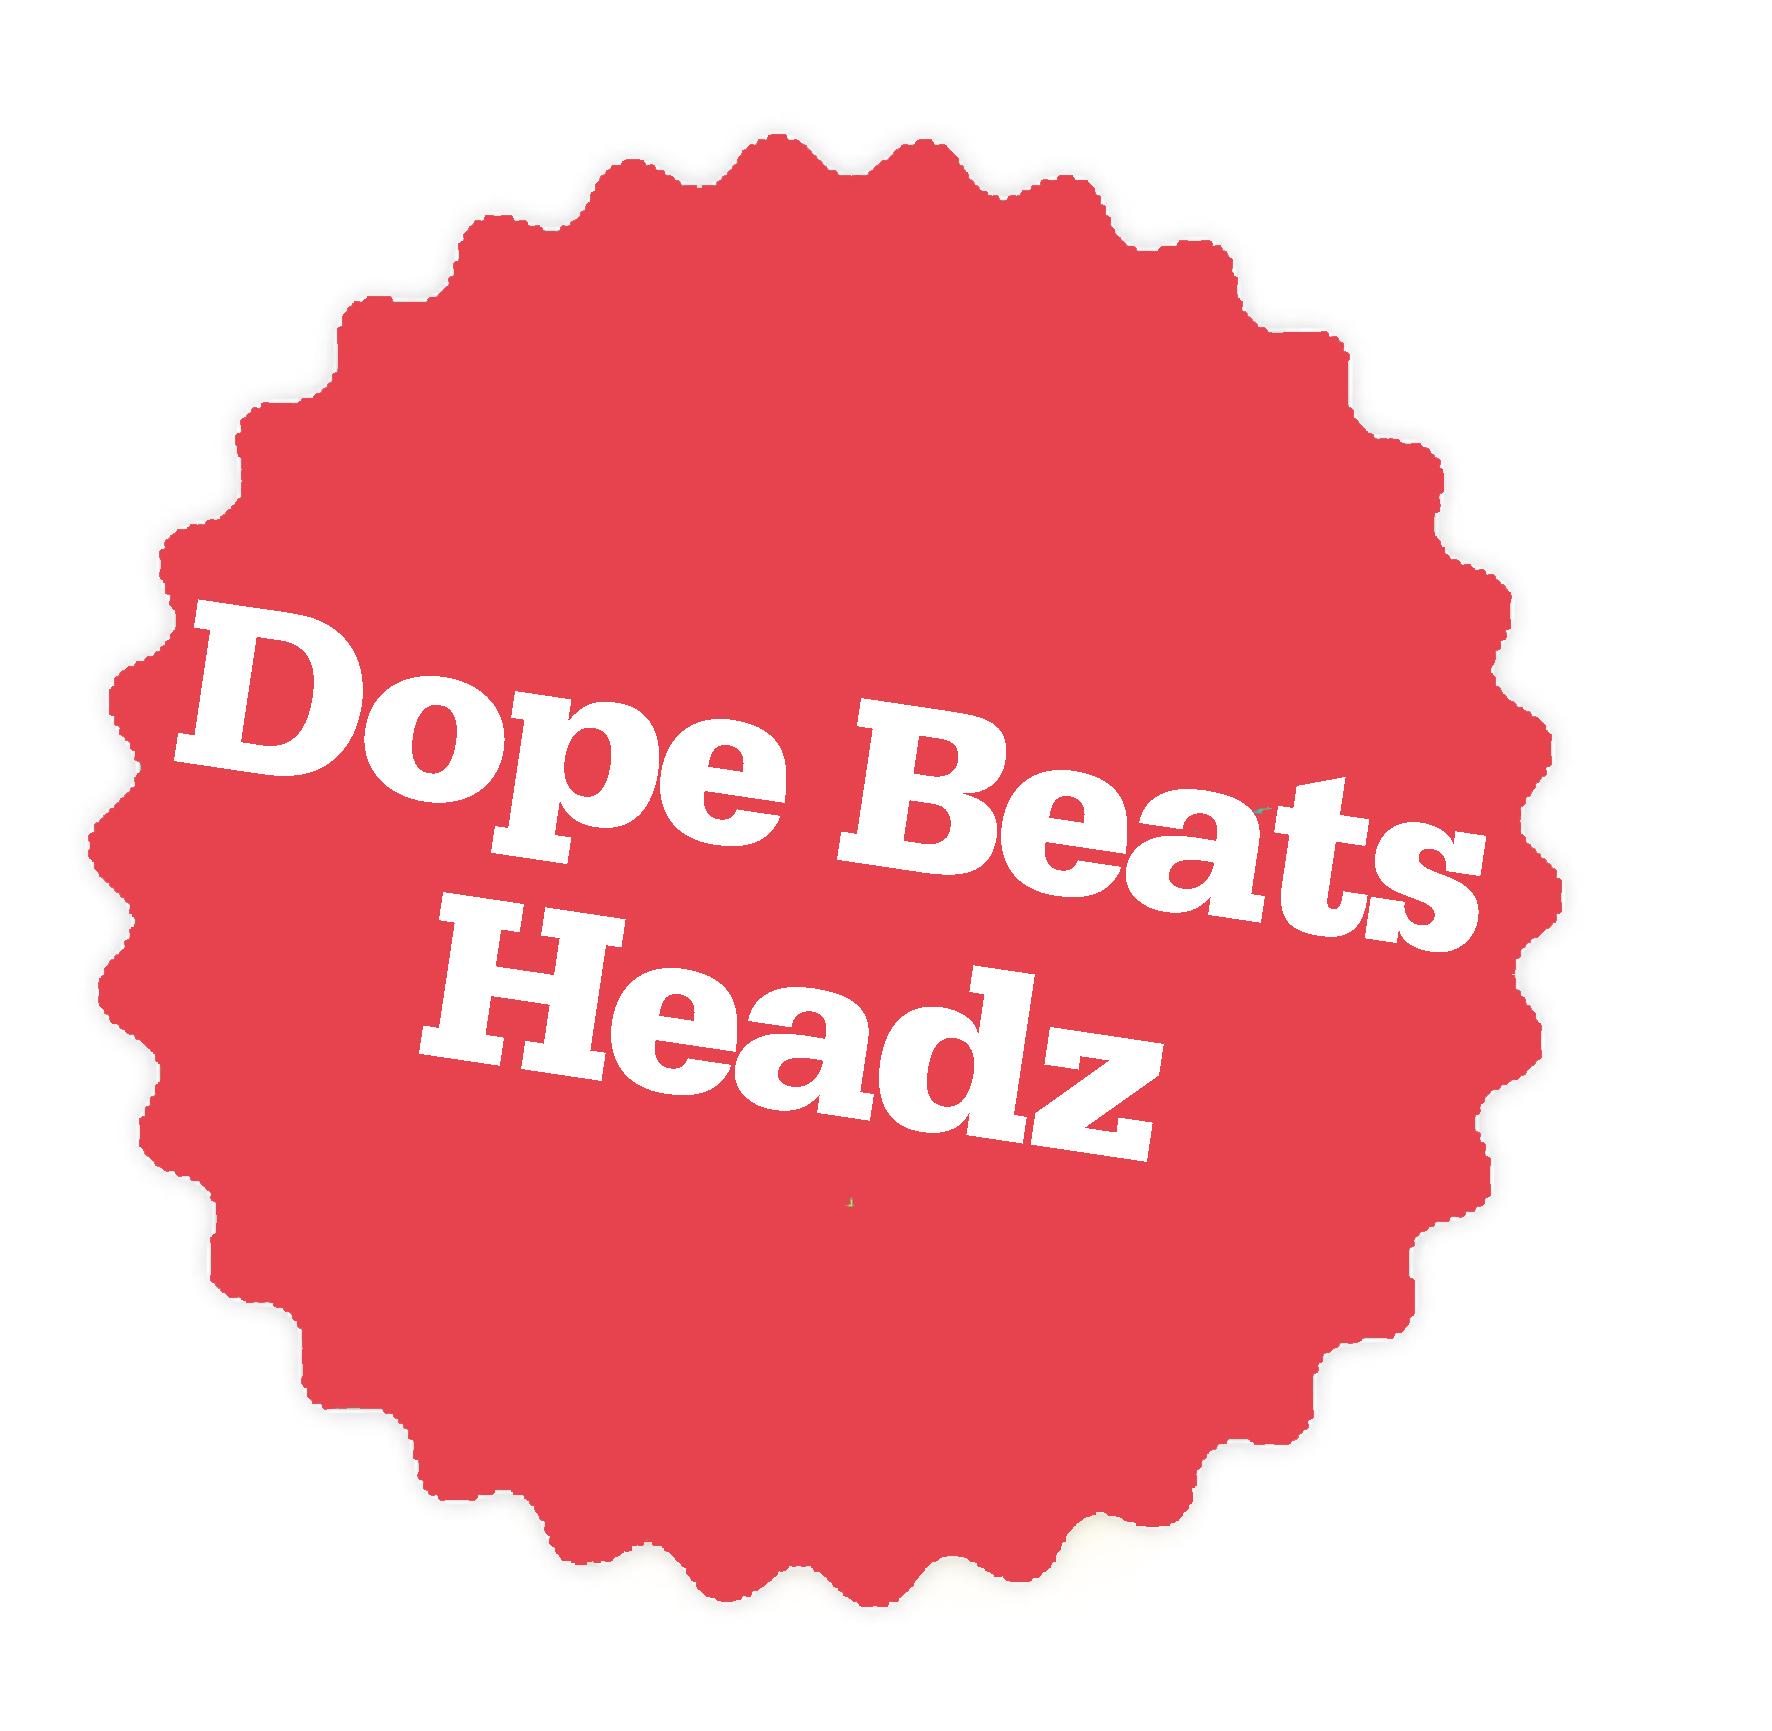 FRESH HERBS – PLANTS BEATS!MenuGFG Star_Dope Beats Headz_rot